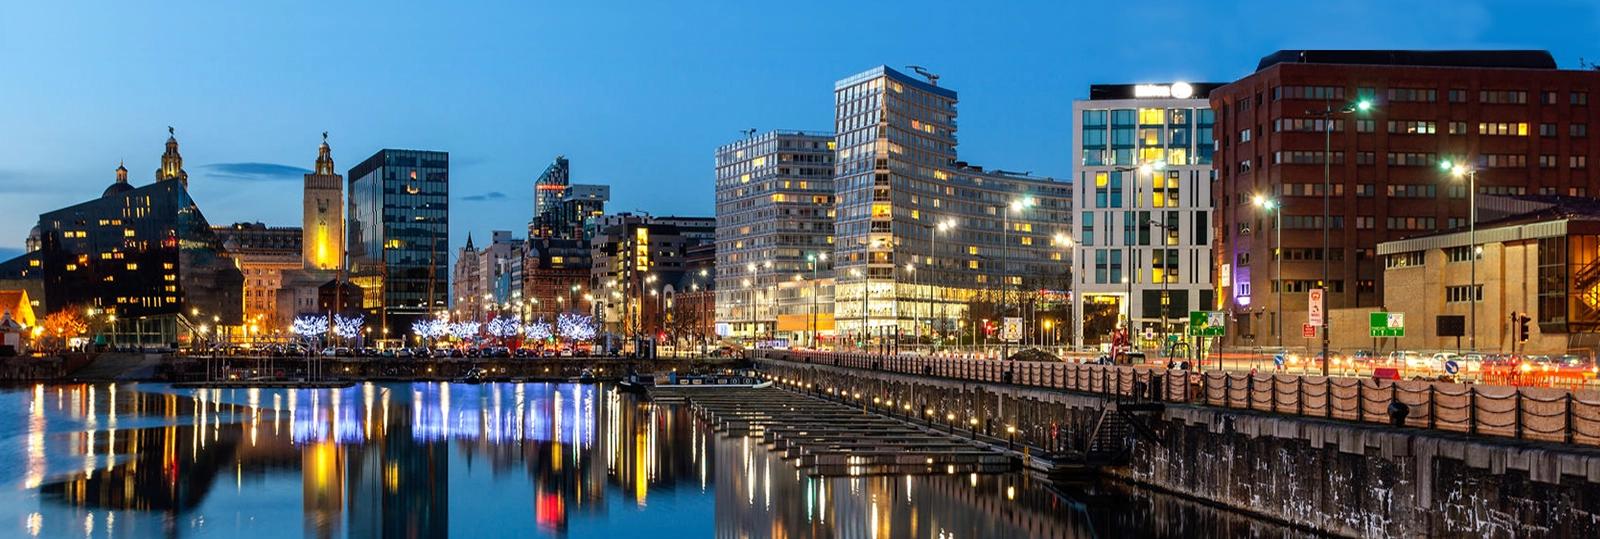 Liverpool docks cityscape at night